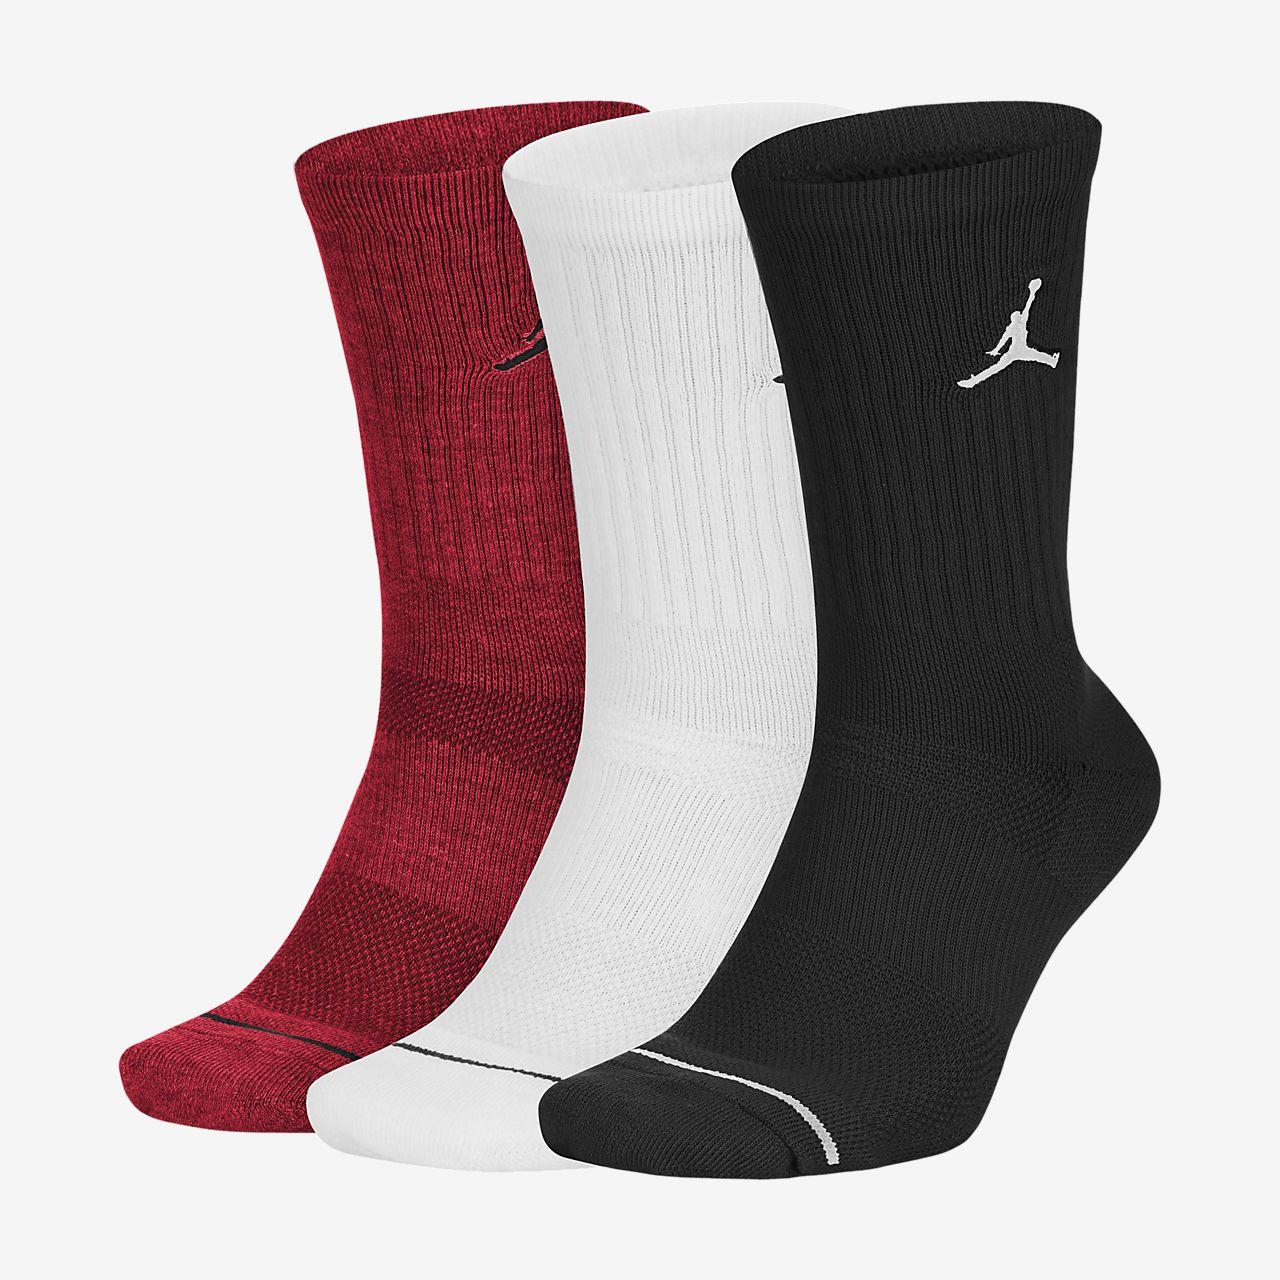 Носки для баскетбола Jordan Jumpman Crew (3 пары)